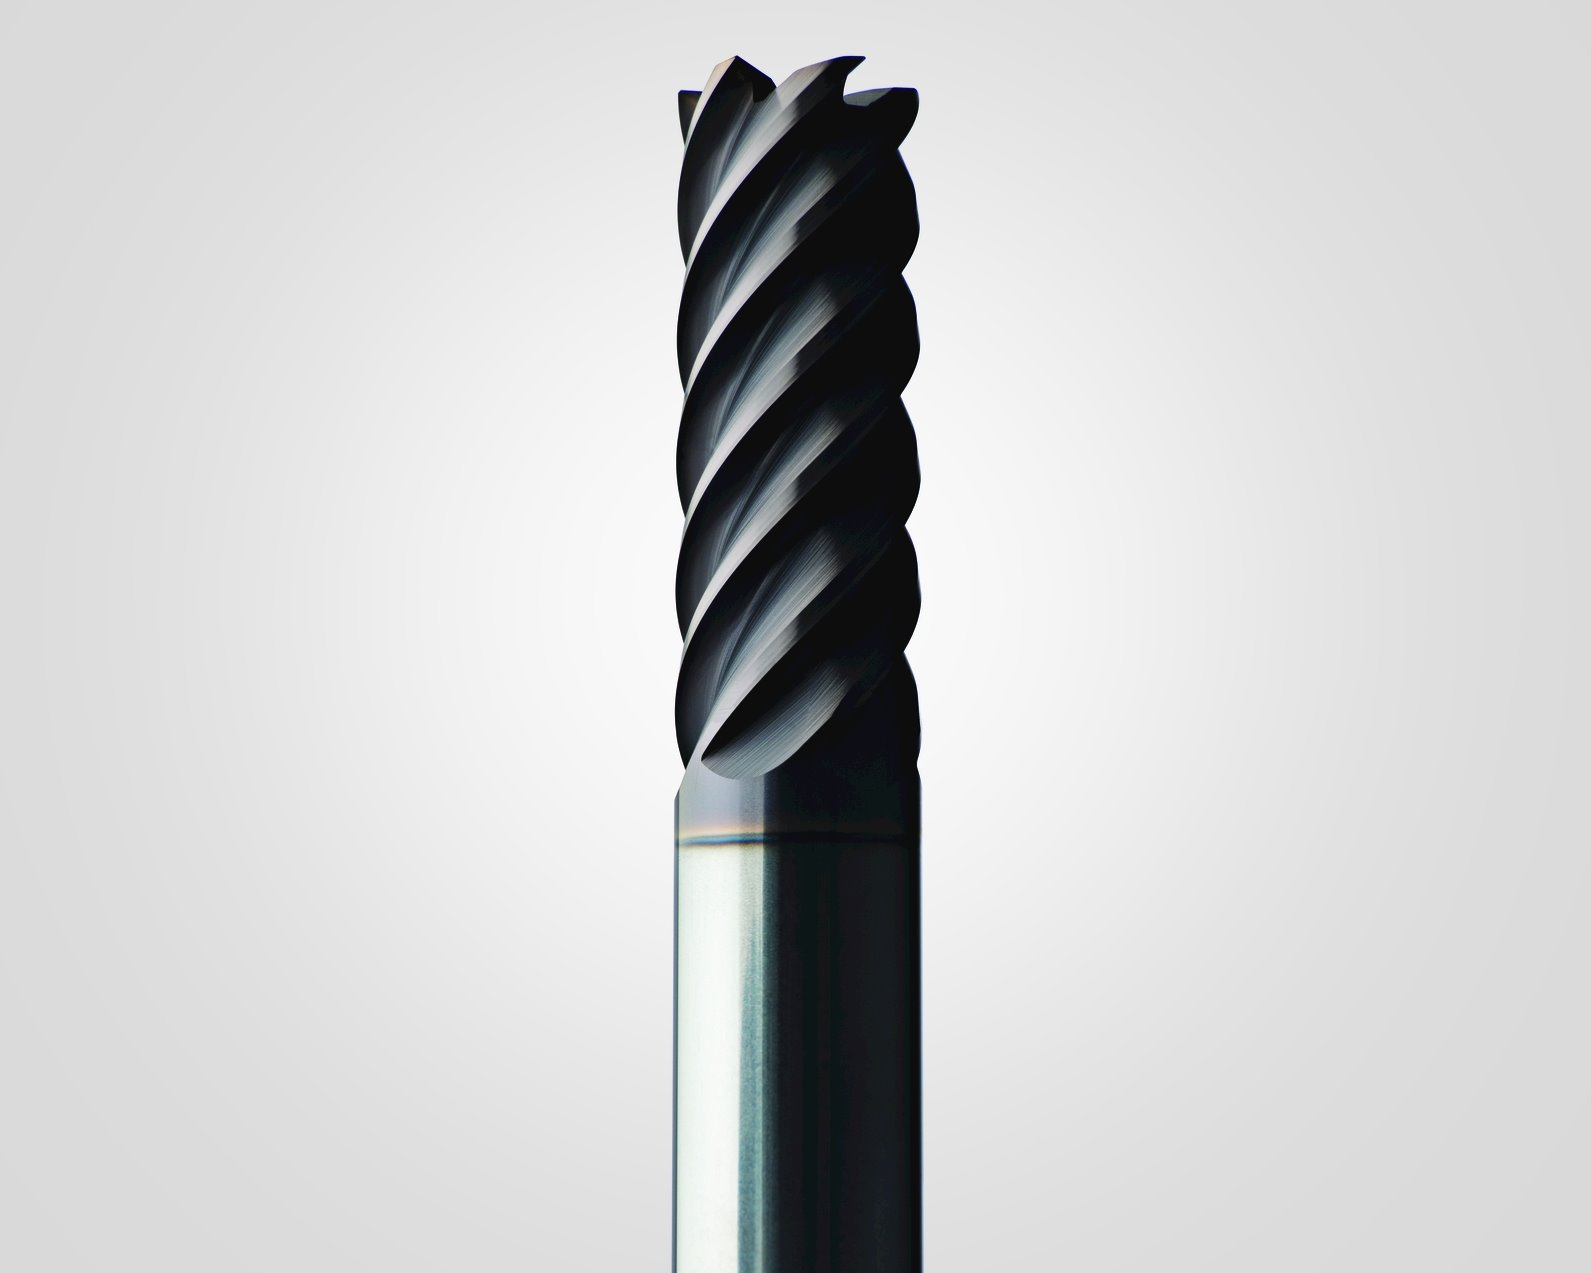 JS520 520 series Multi-flute endmills